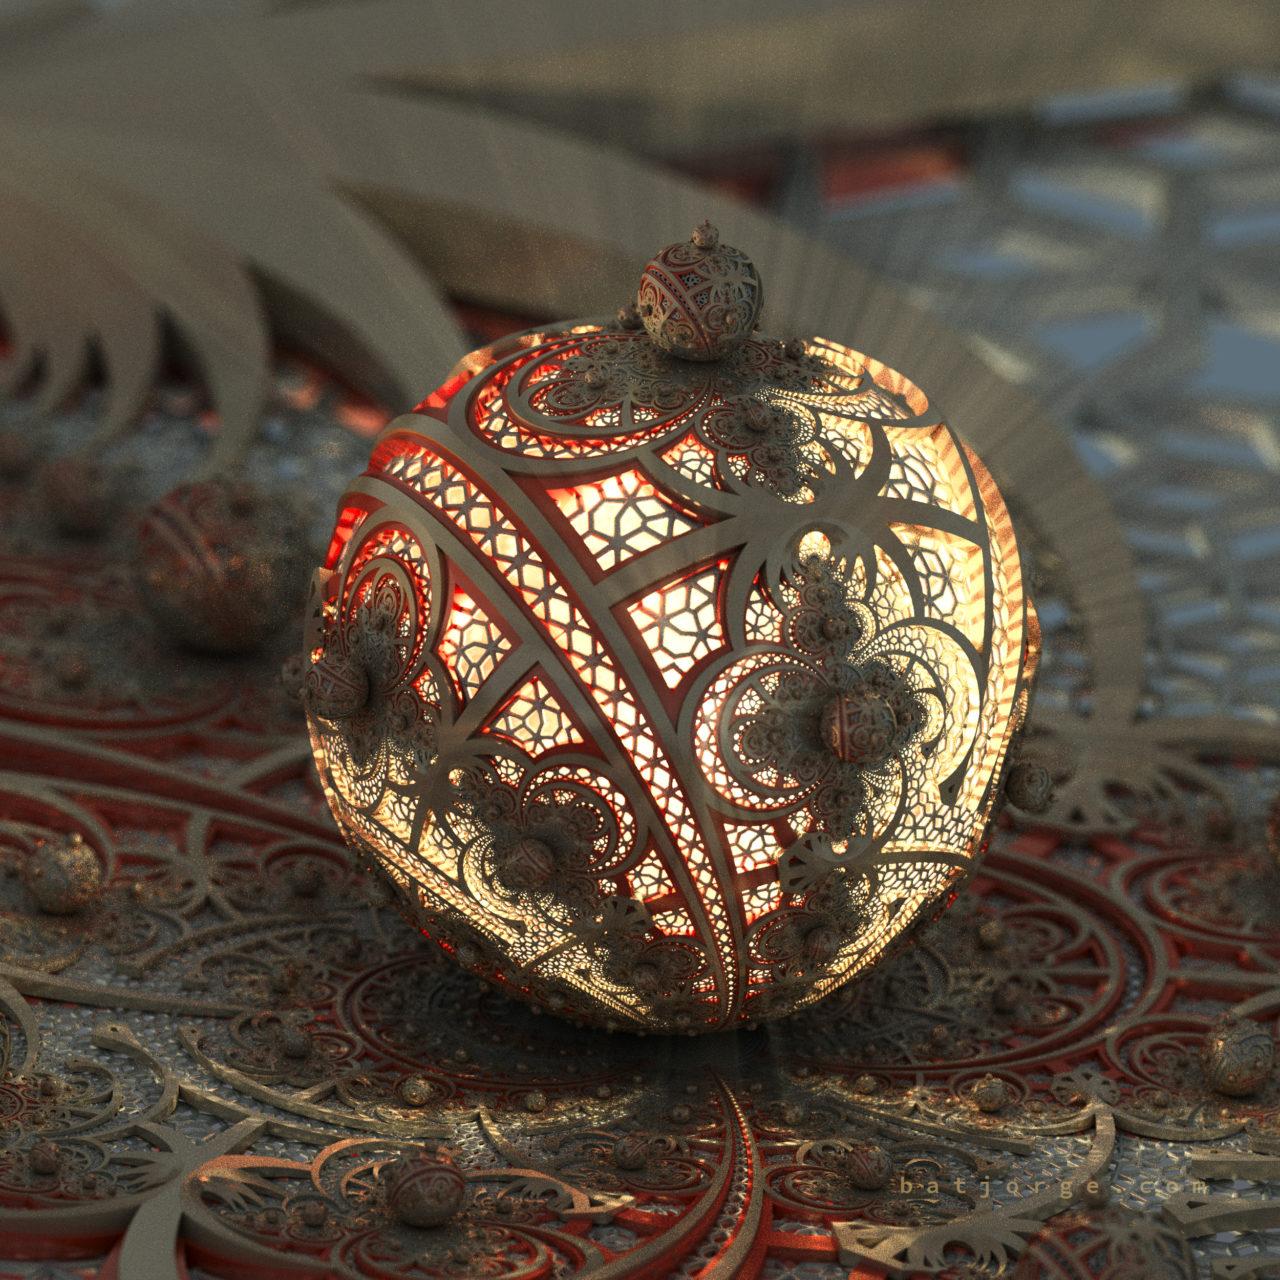 3D fractal orb. mandelbulb3d